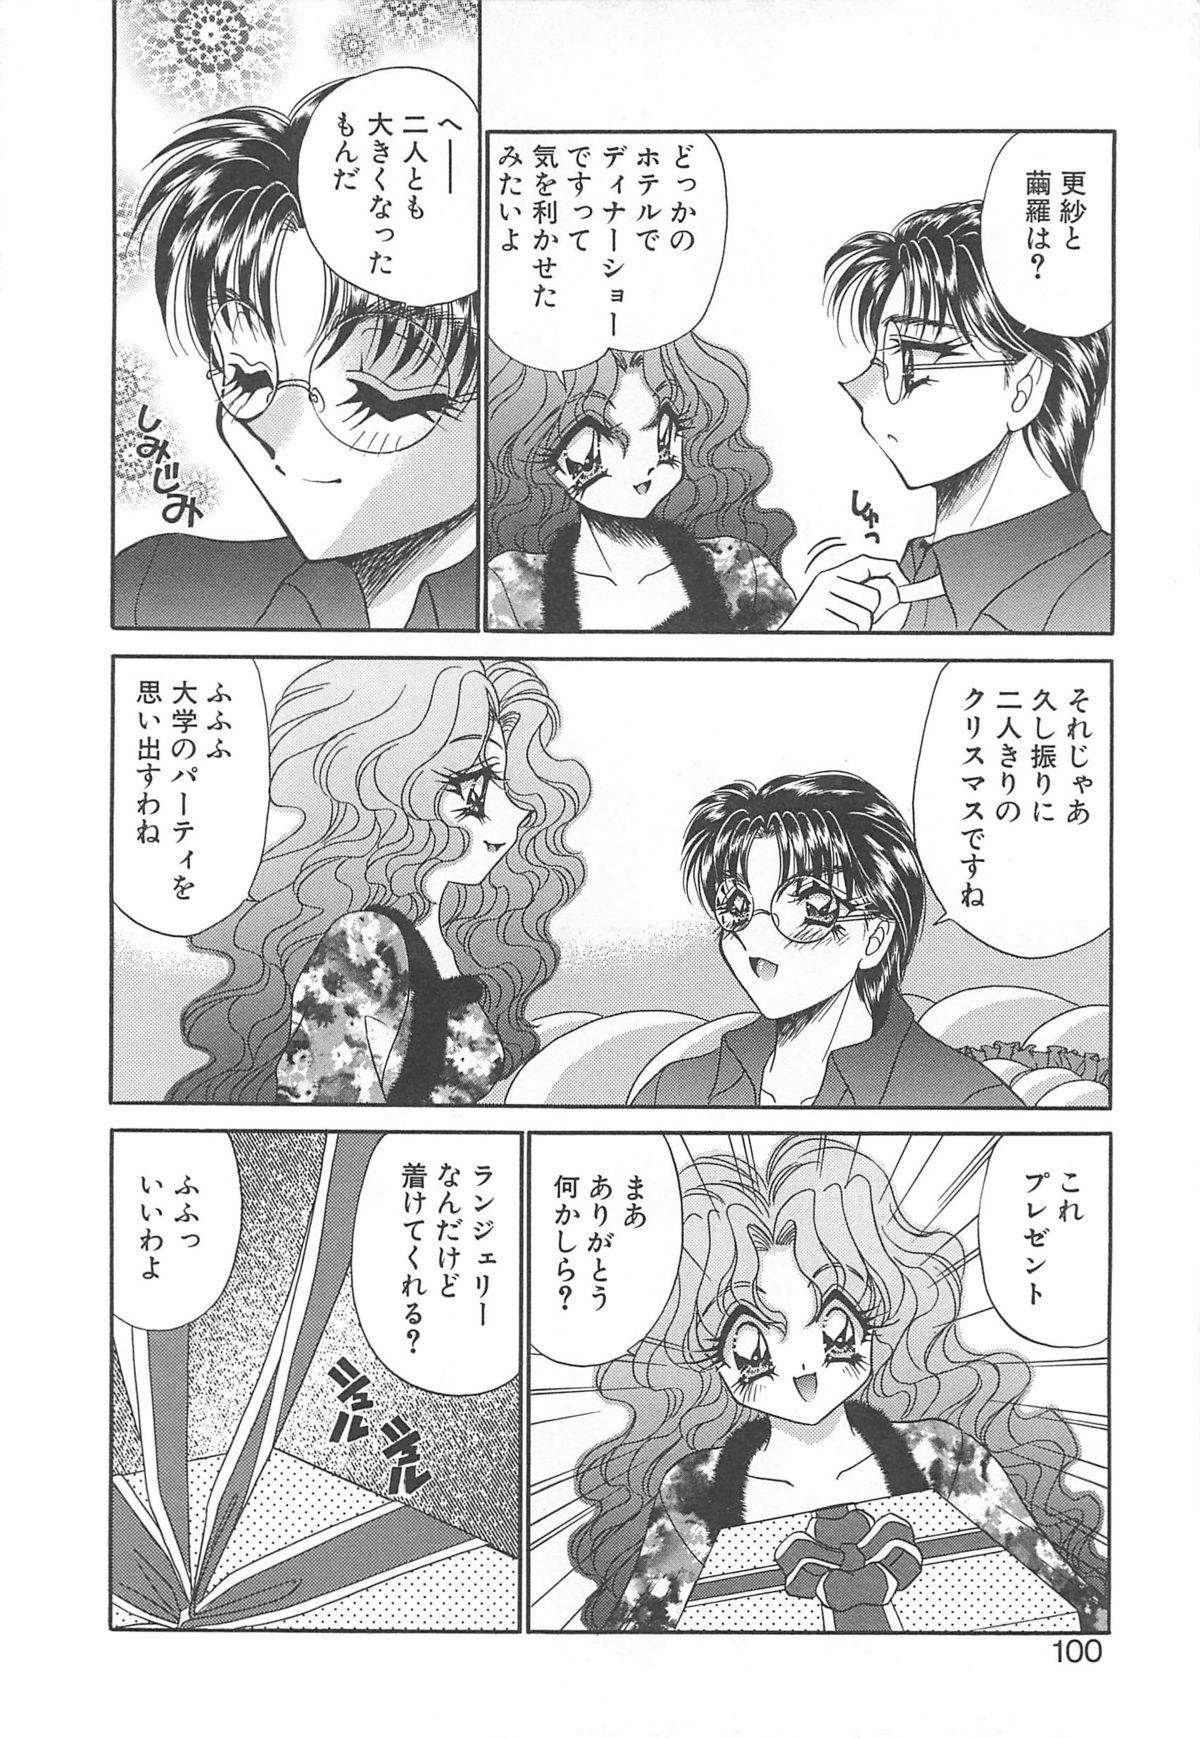 Kigurumi Sentai Quiltian 98